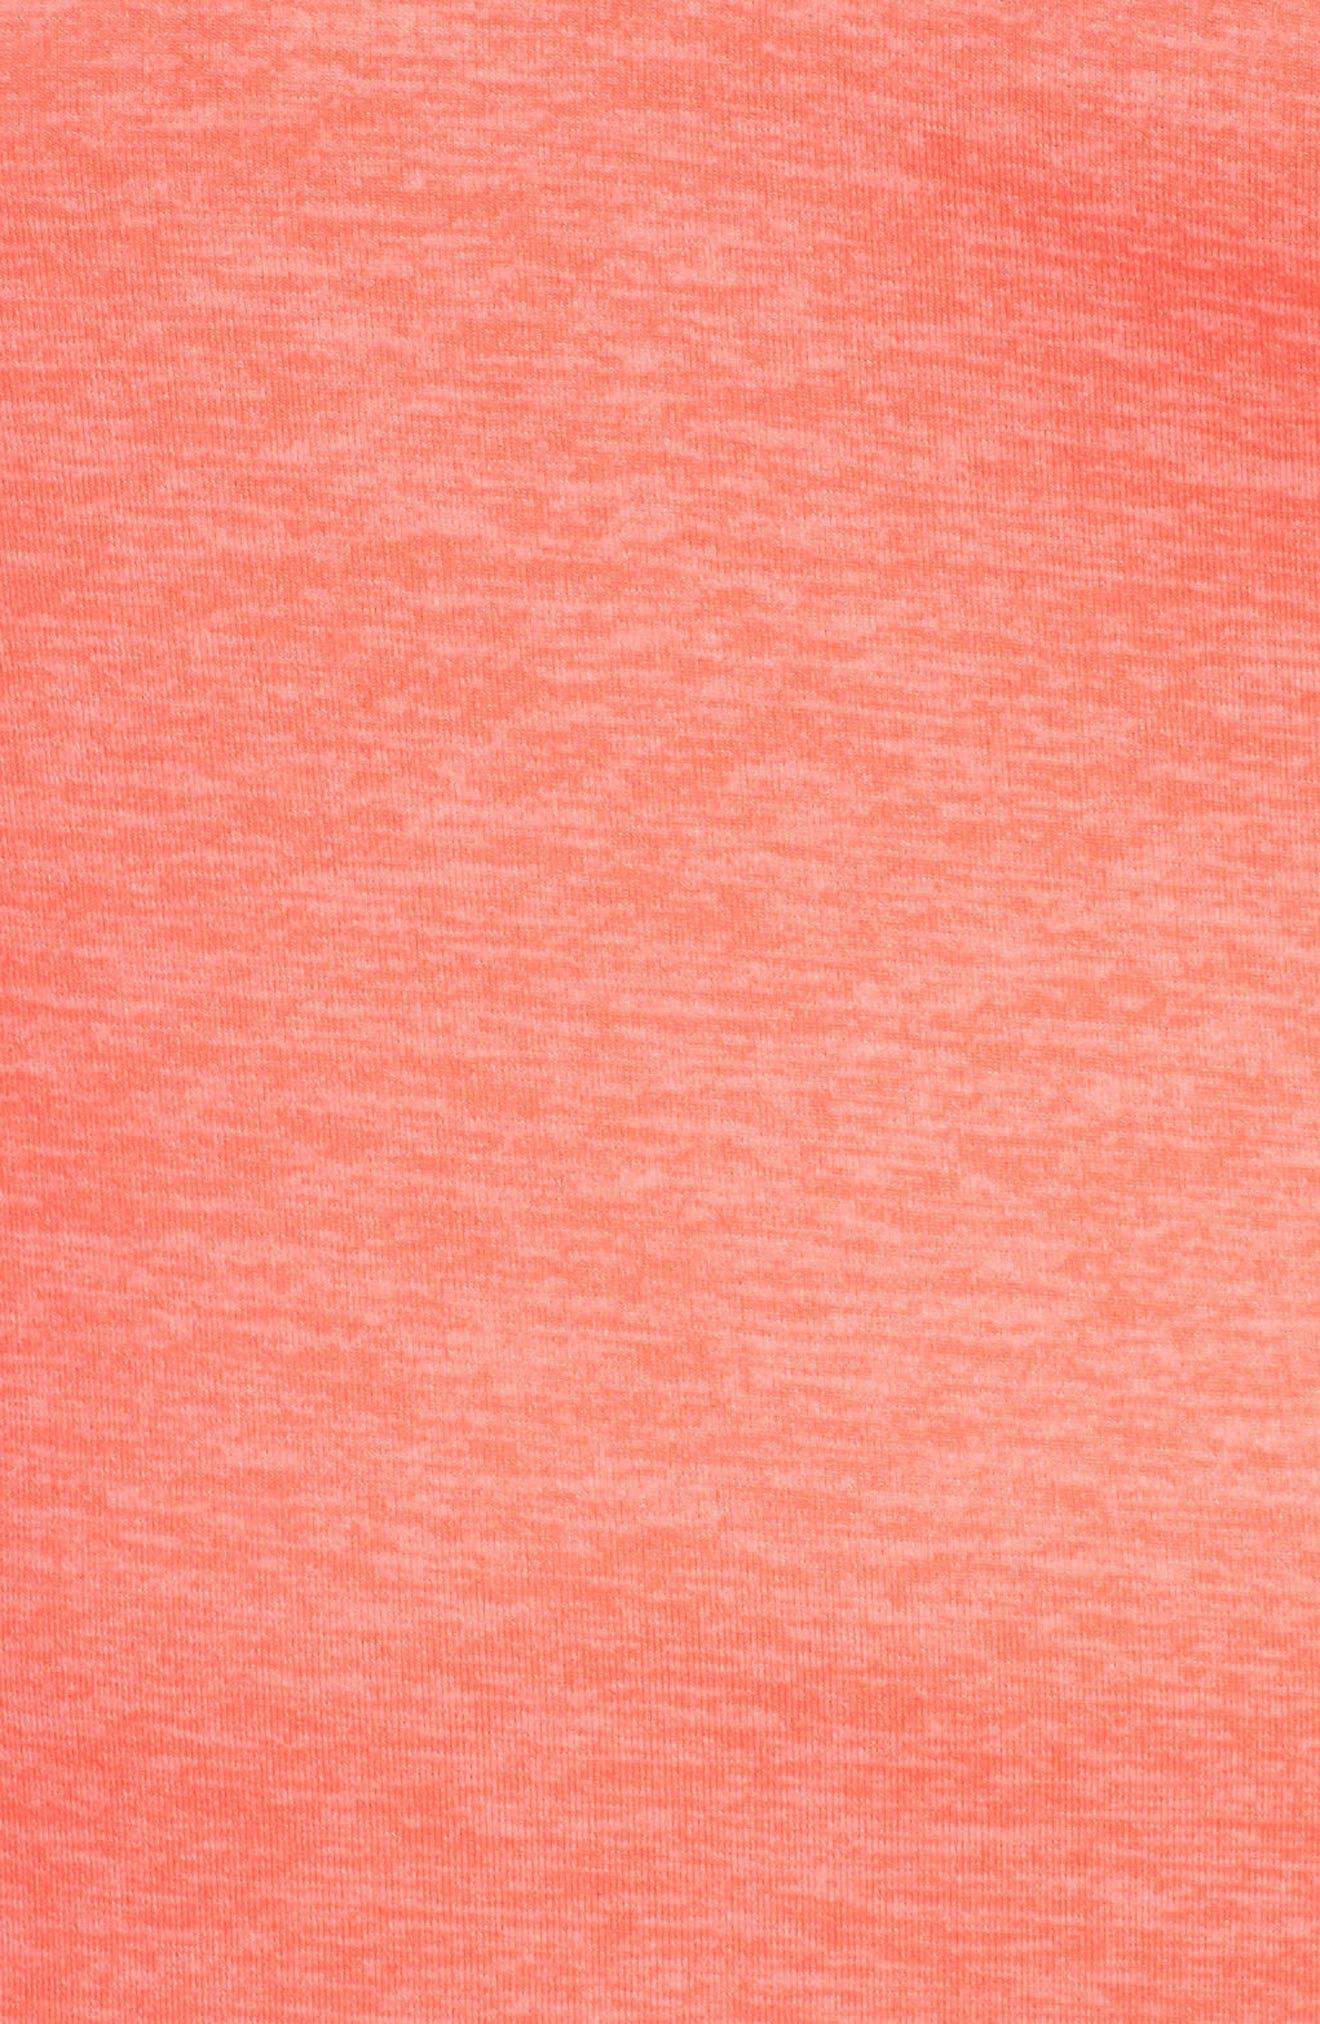 Dry Element Half Zip Top,                             Alternate thumbnail 5, color,                             Crimson Pulse/ Heater